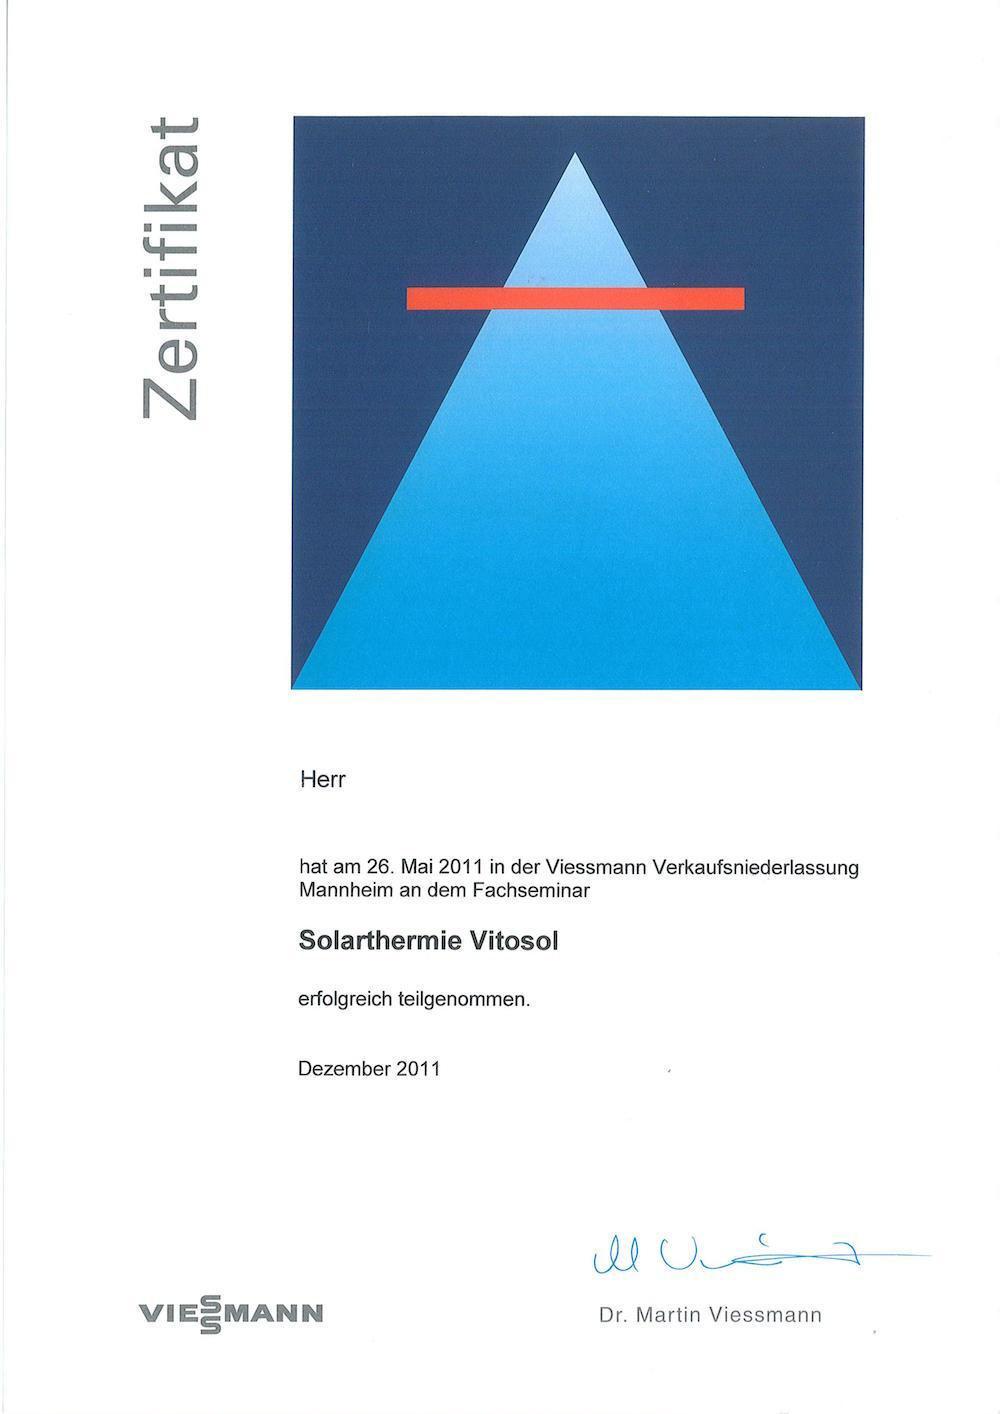 Solarthermie Vitosol